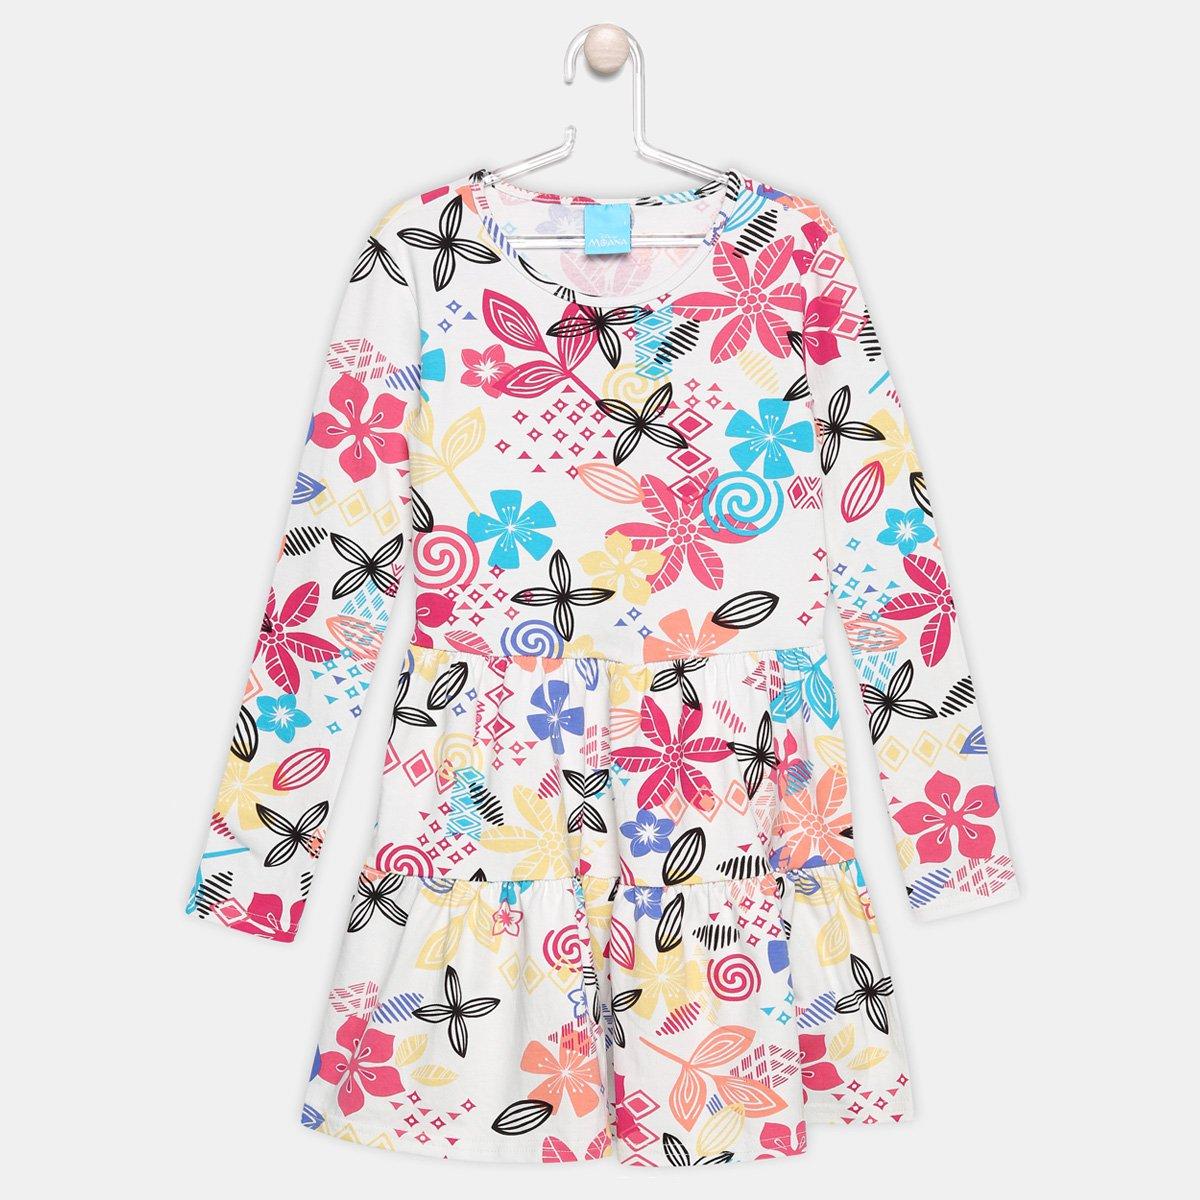 Vestido Malwee Moana Manga Longa Infantil - Compre Agora  a97da5abc7170